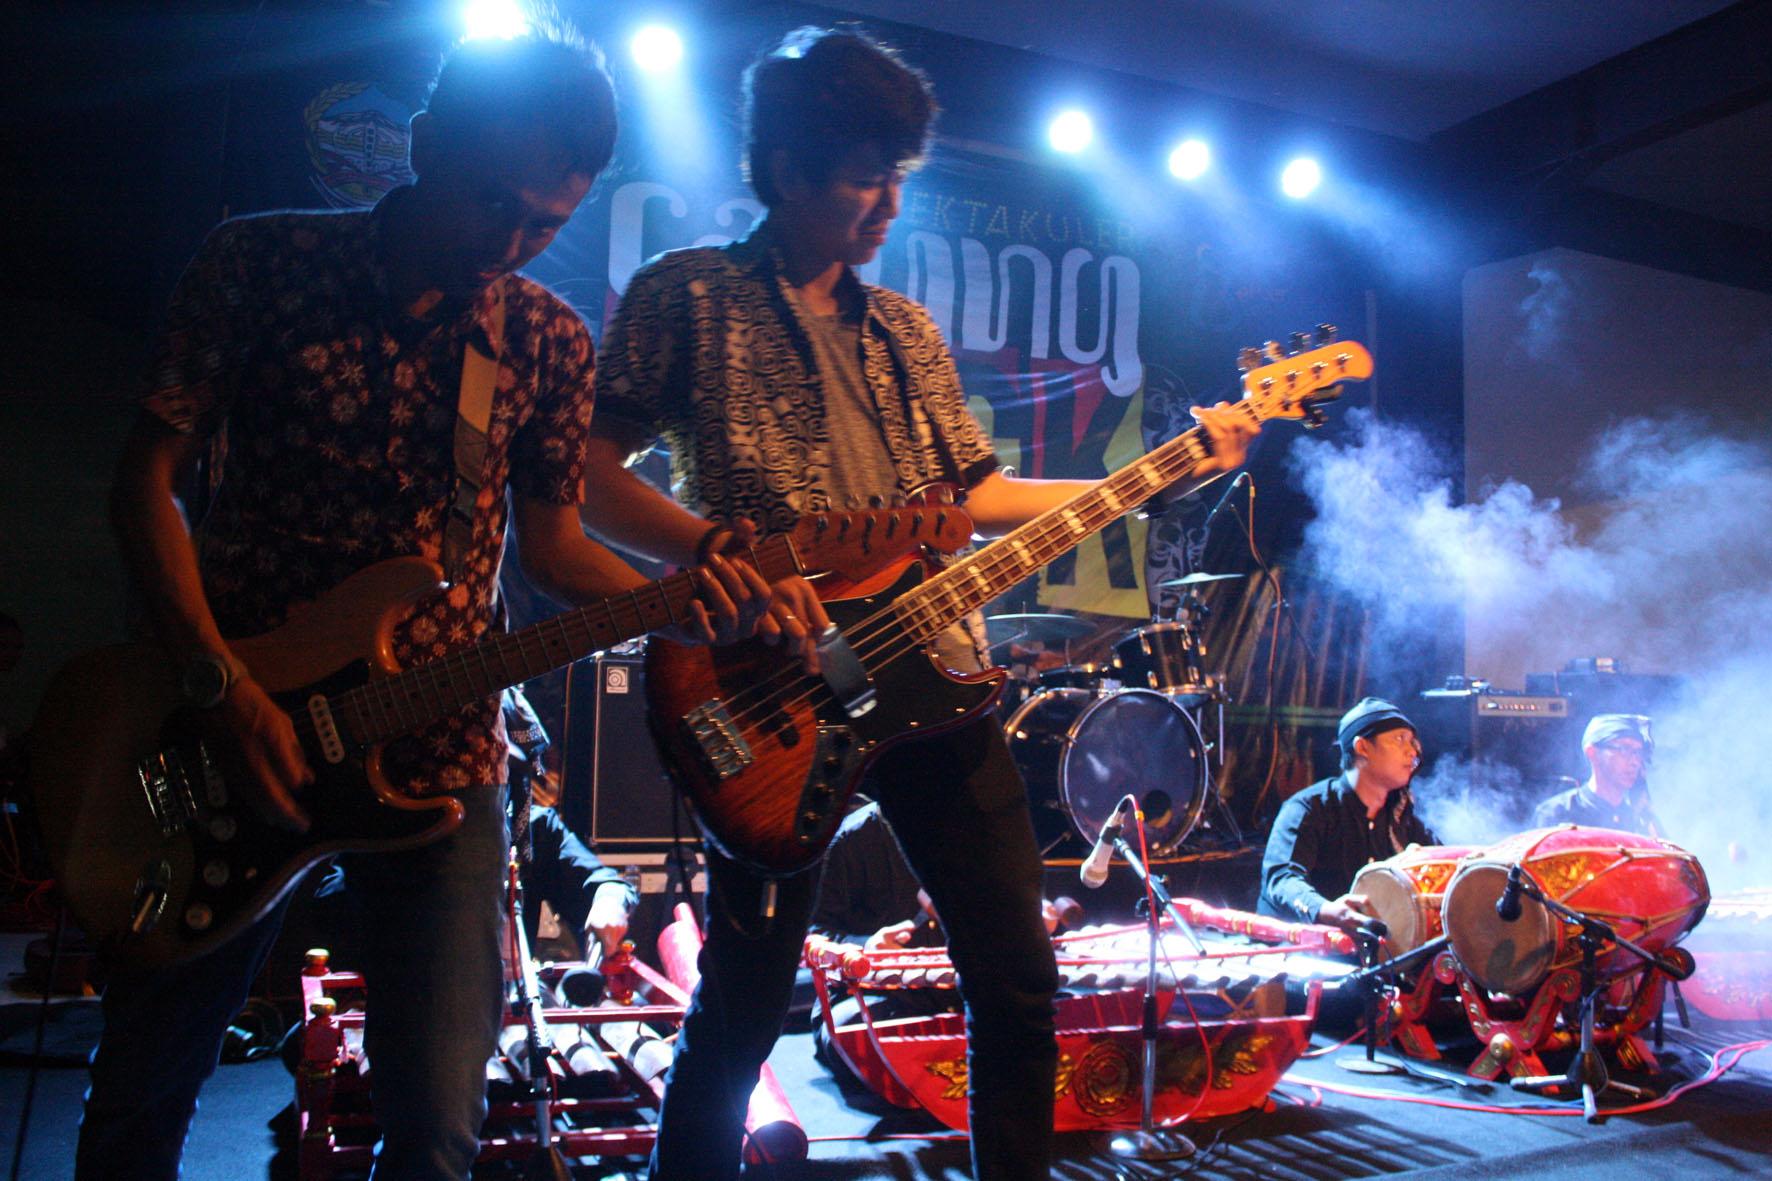 Musisi Muda Purwokerto Suguhkan Kolaborasi Calung Rock Smkn 3 Banyumas